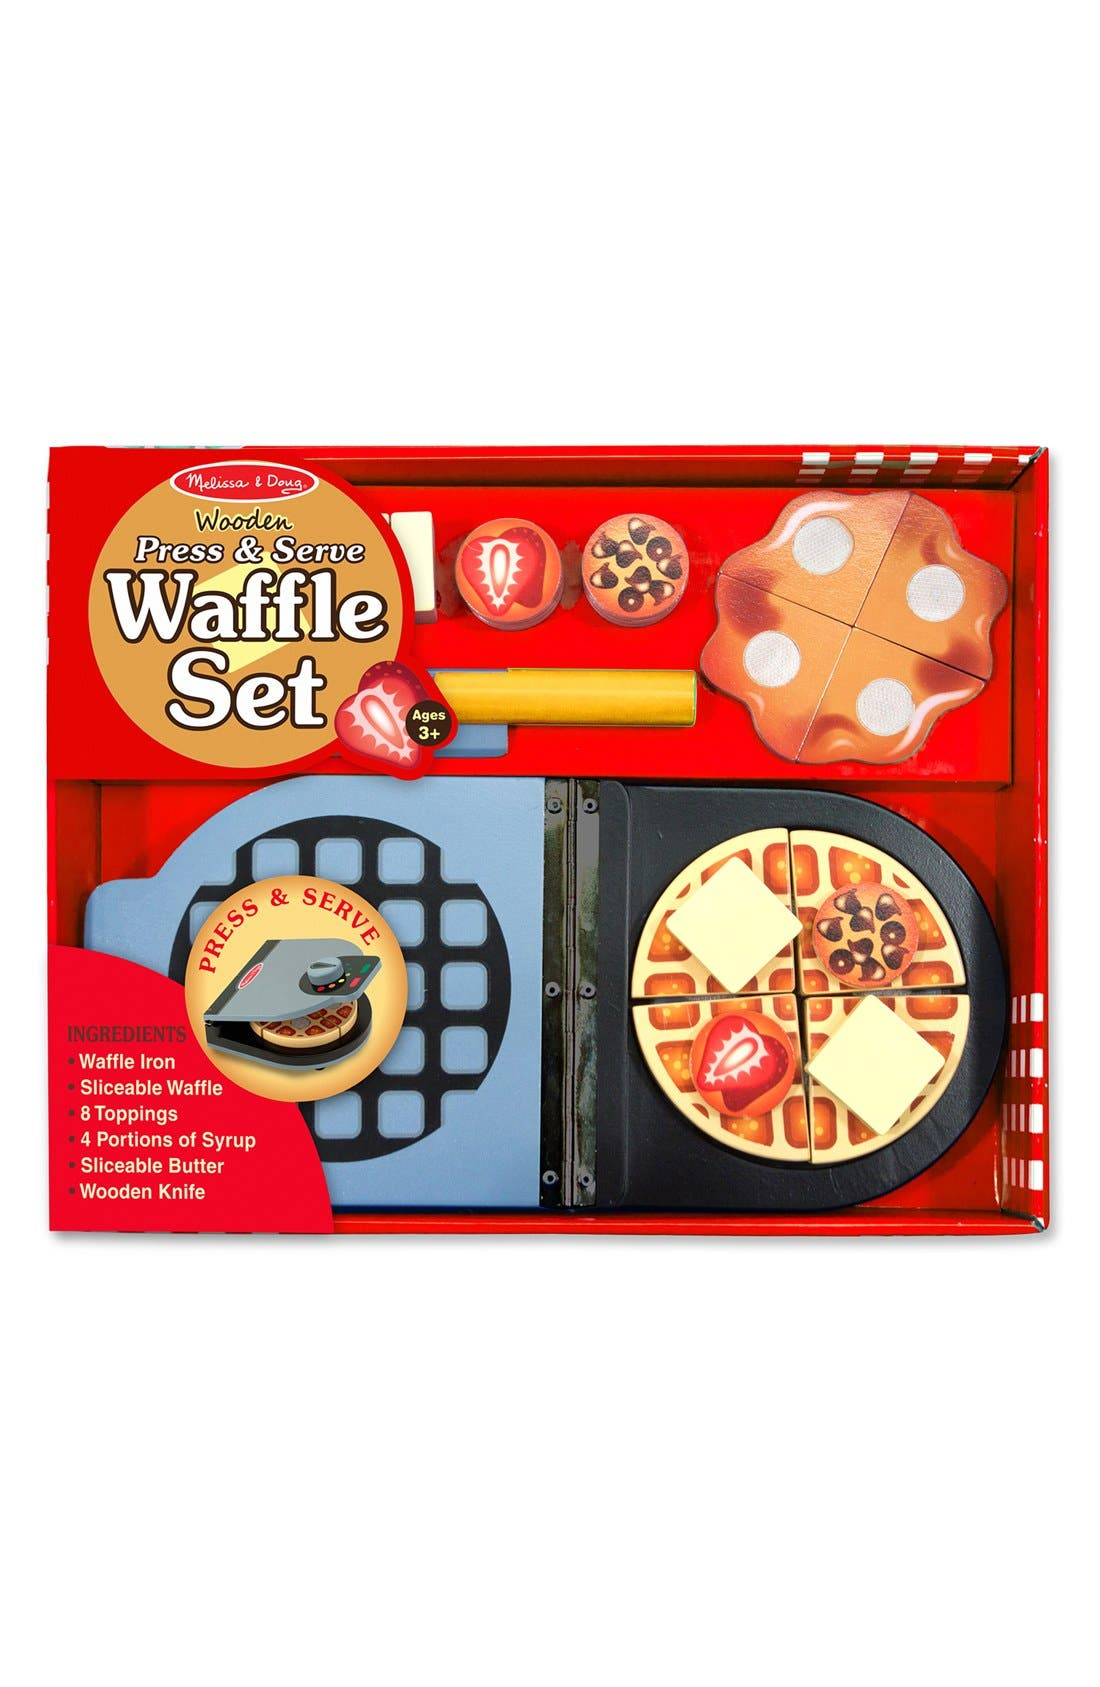 'Press & Serve' Wooden Waffle Set,                             Main thumbnail 1, color,                             Red